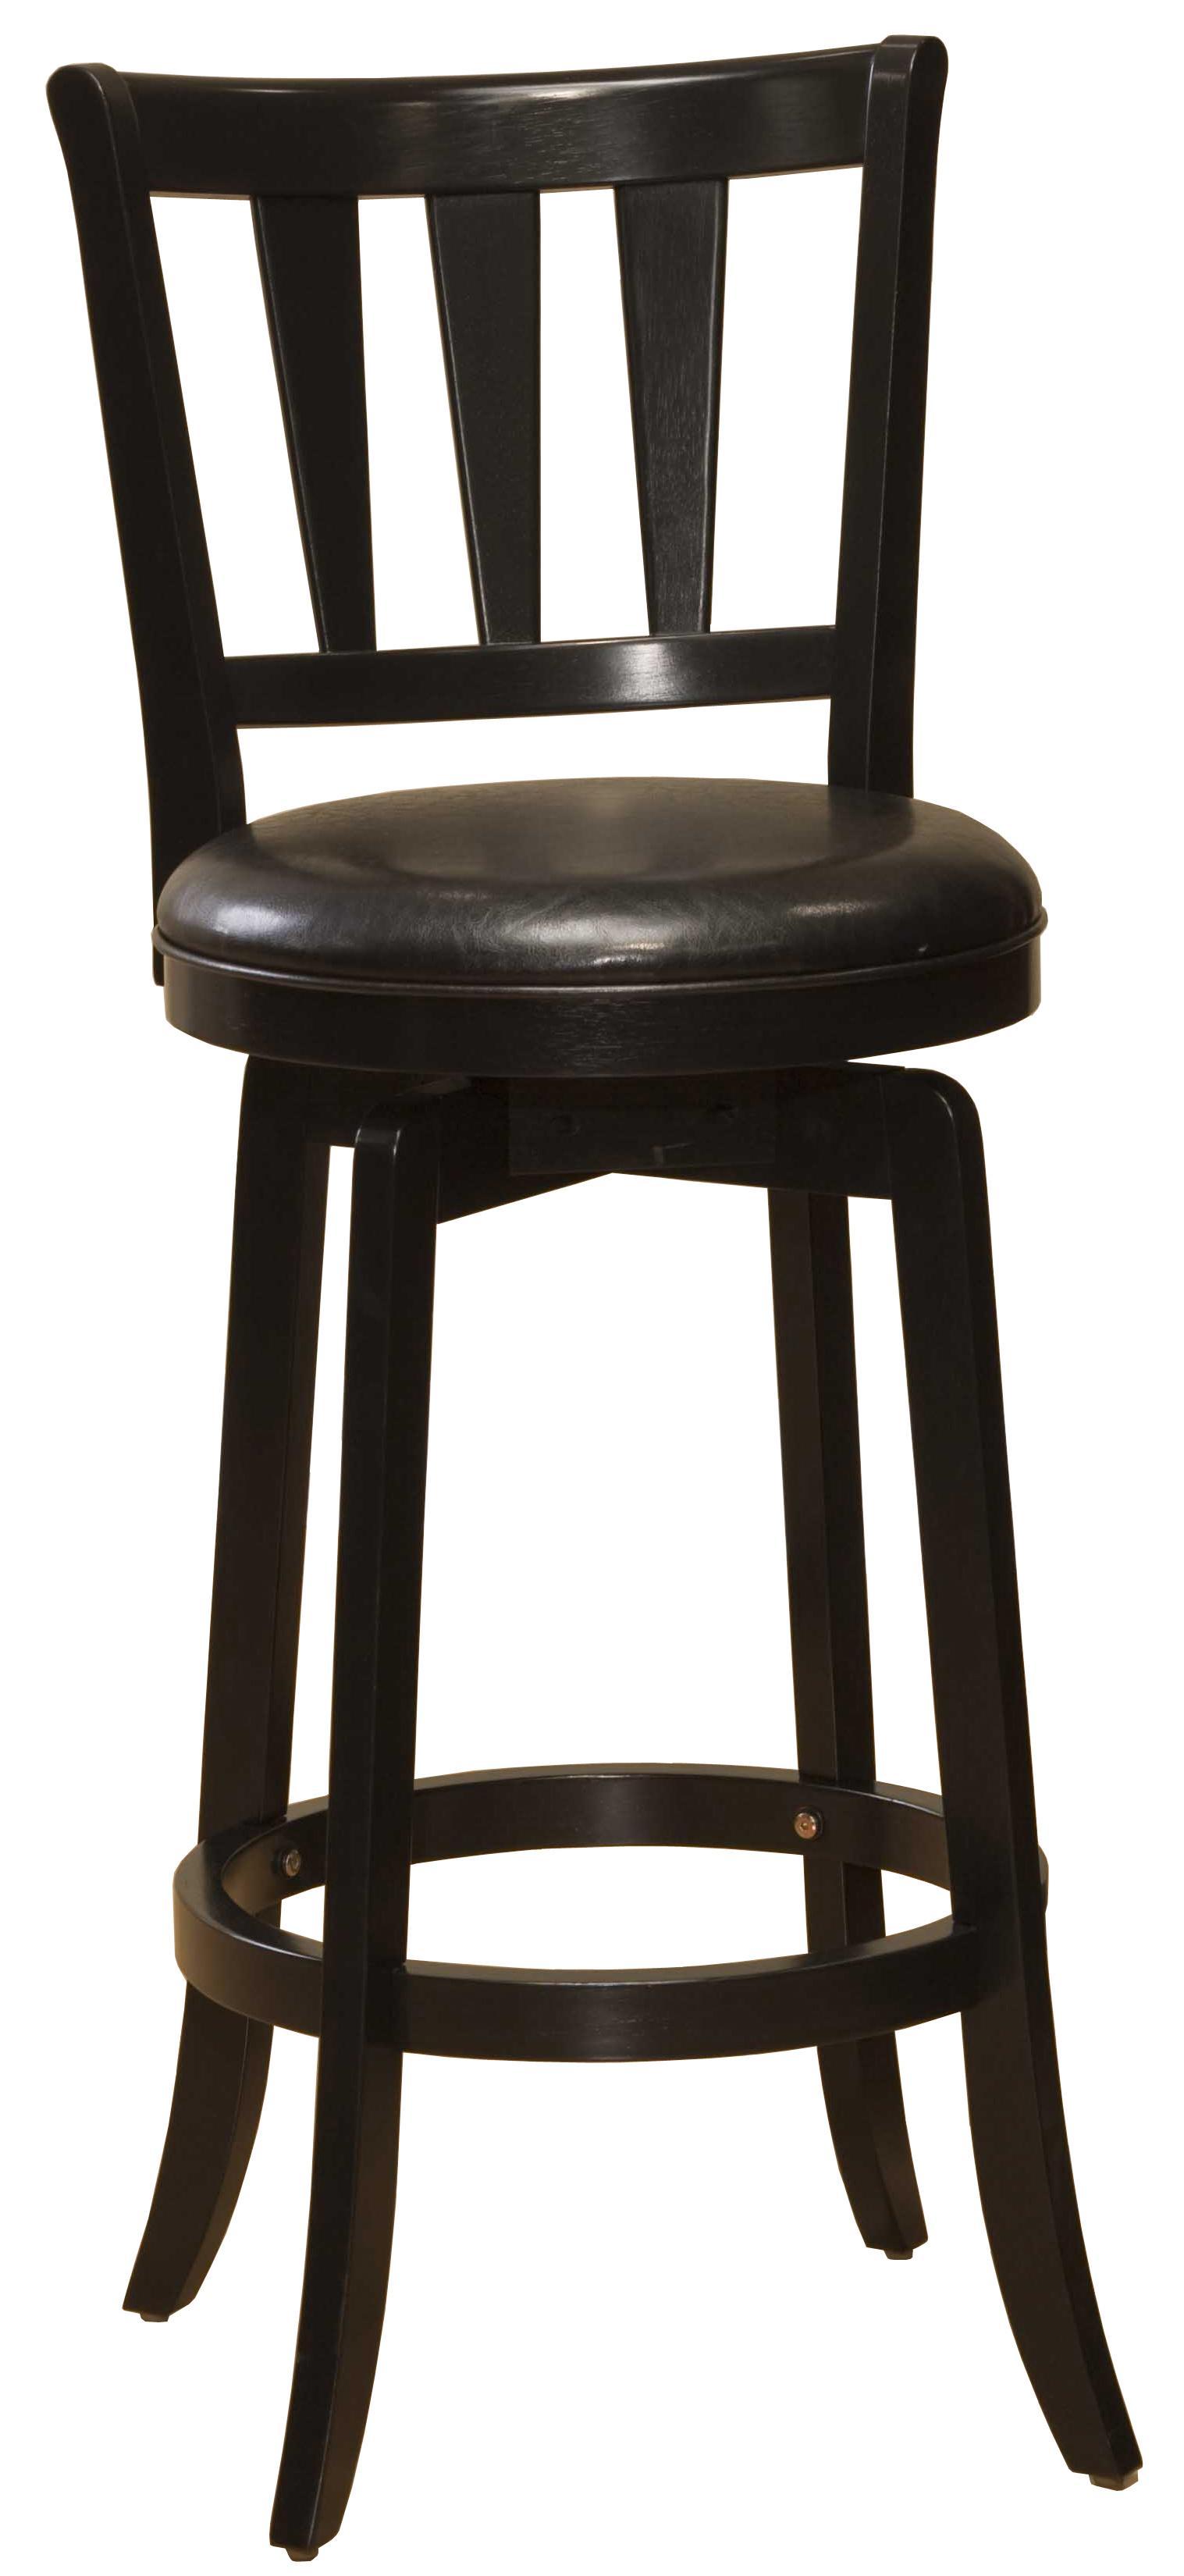 Wood Stools 30 Bar Height Presque Isle Swivel Bar Stool